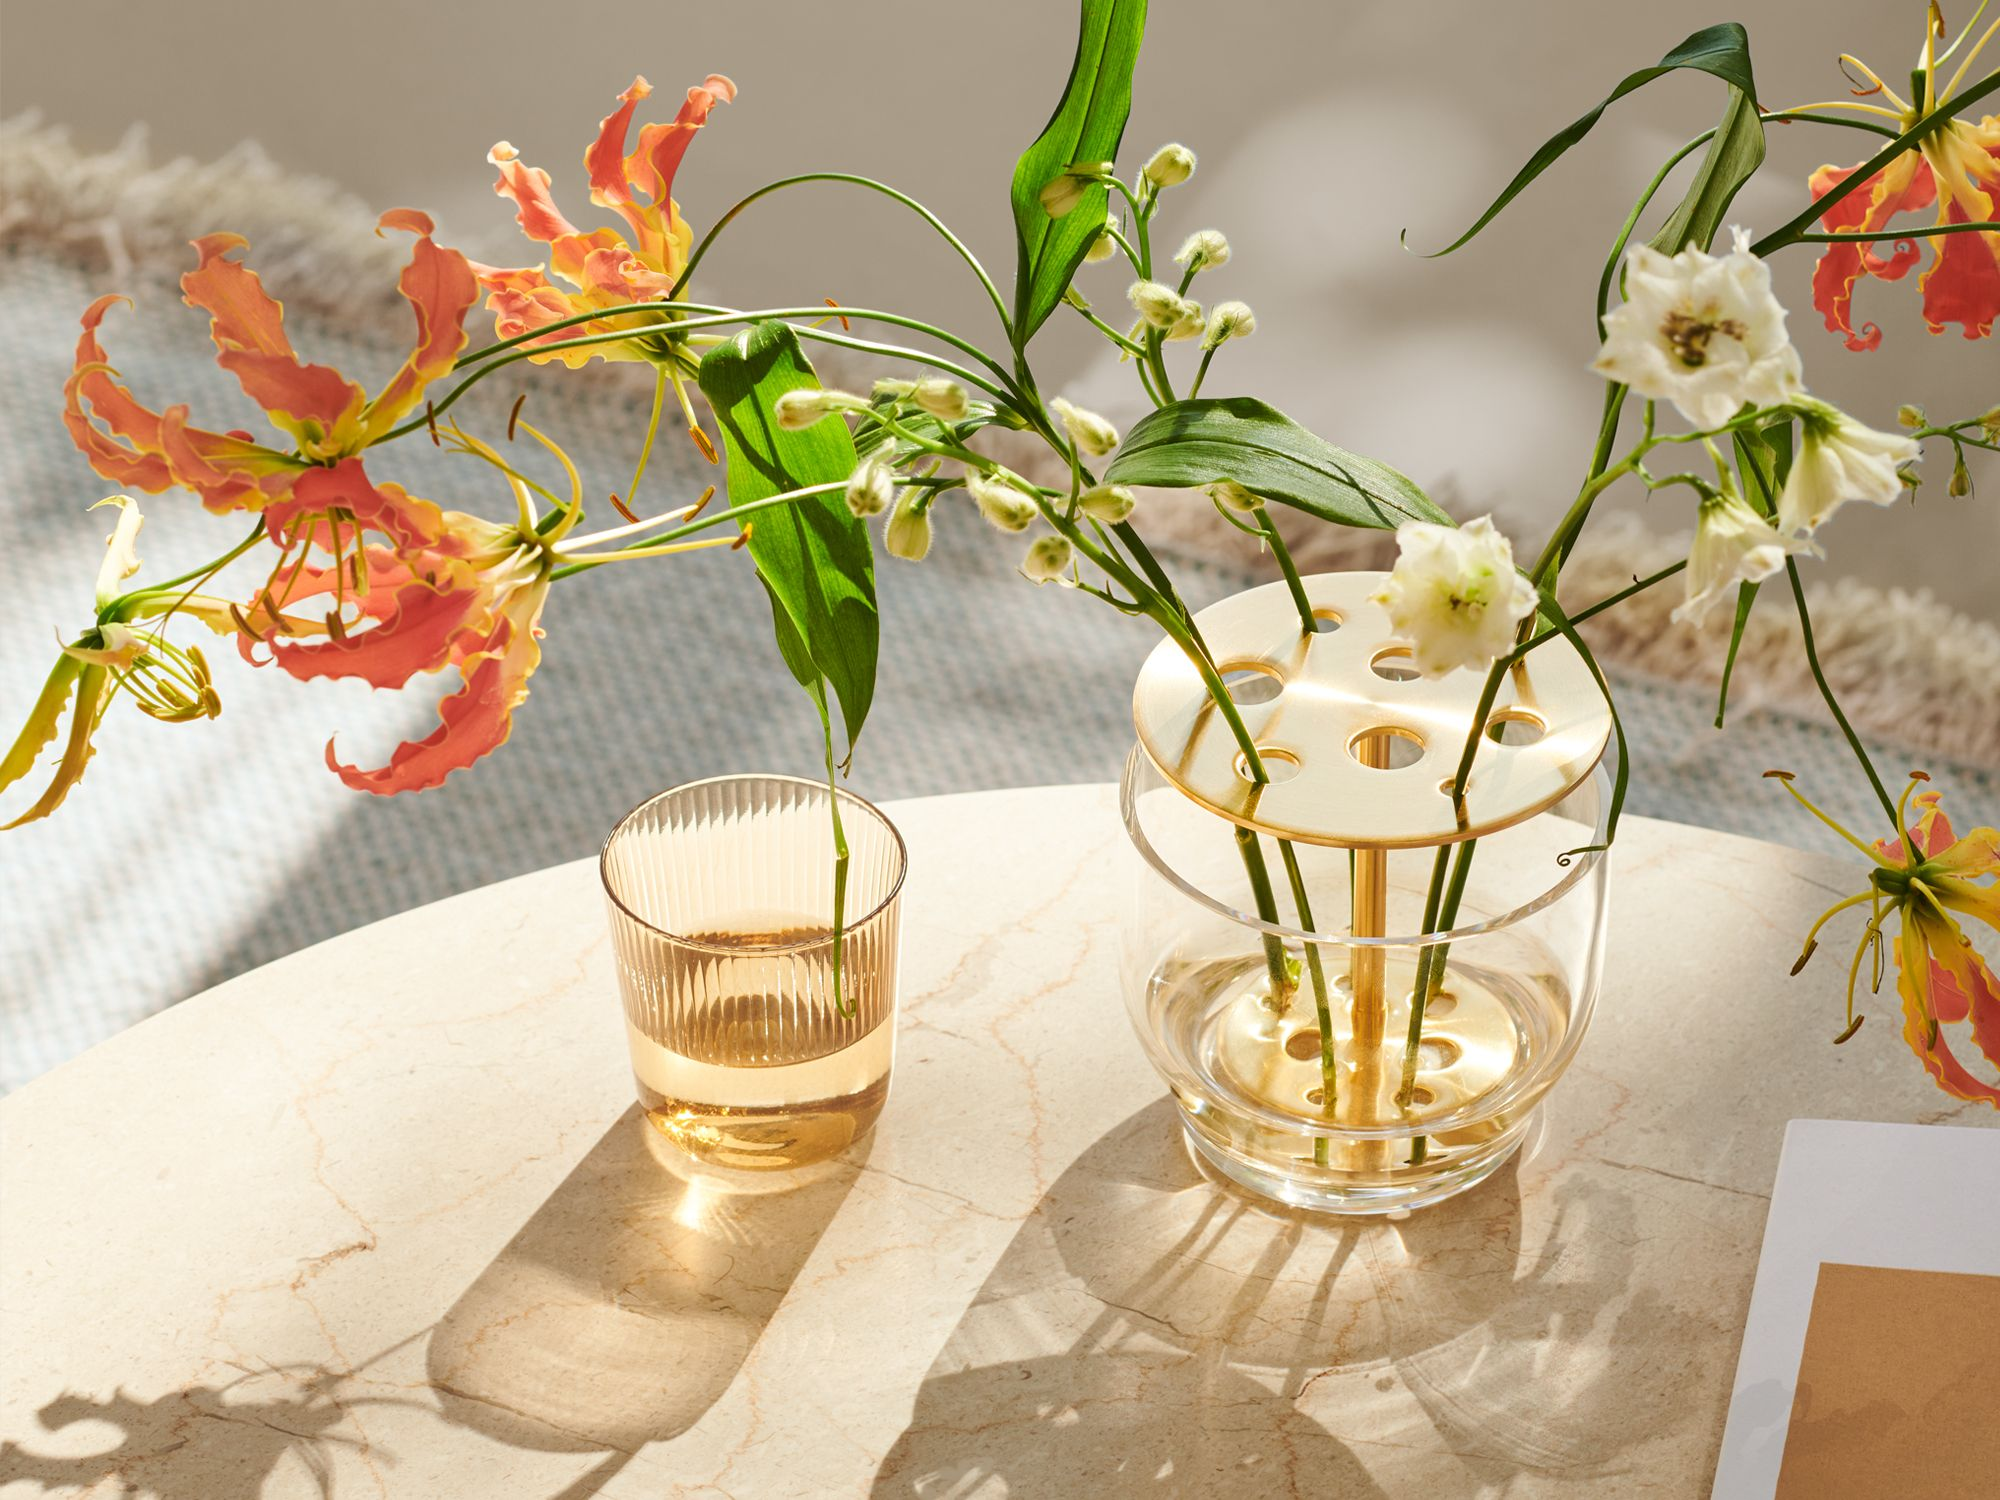 Fritz Hansen Ikebana vases by Jaime Hayon, from W. Atelier